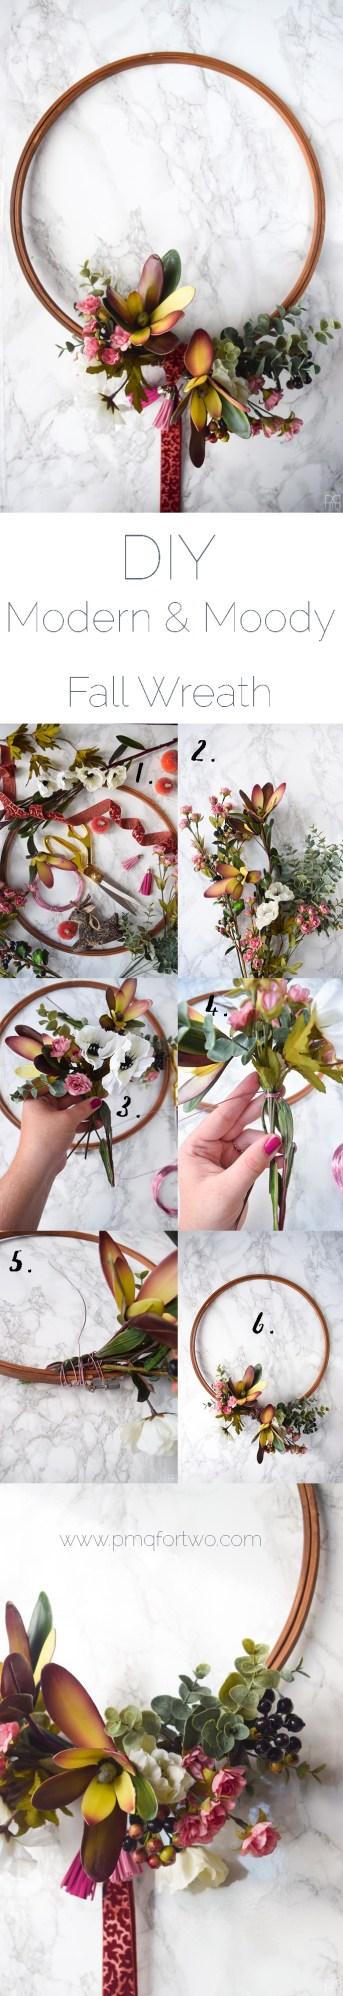 diy-moody-modern-fall-wreath pinterest image